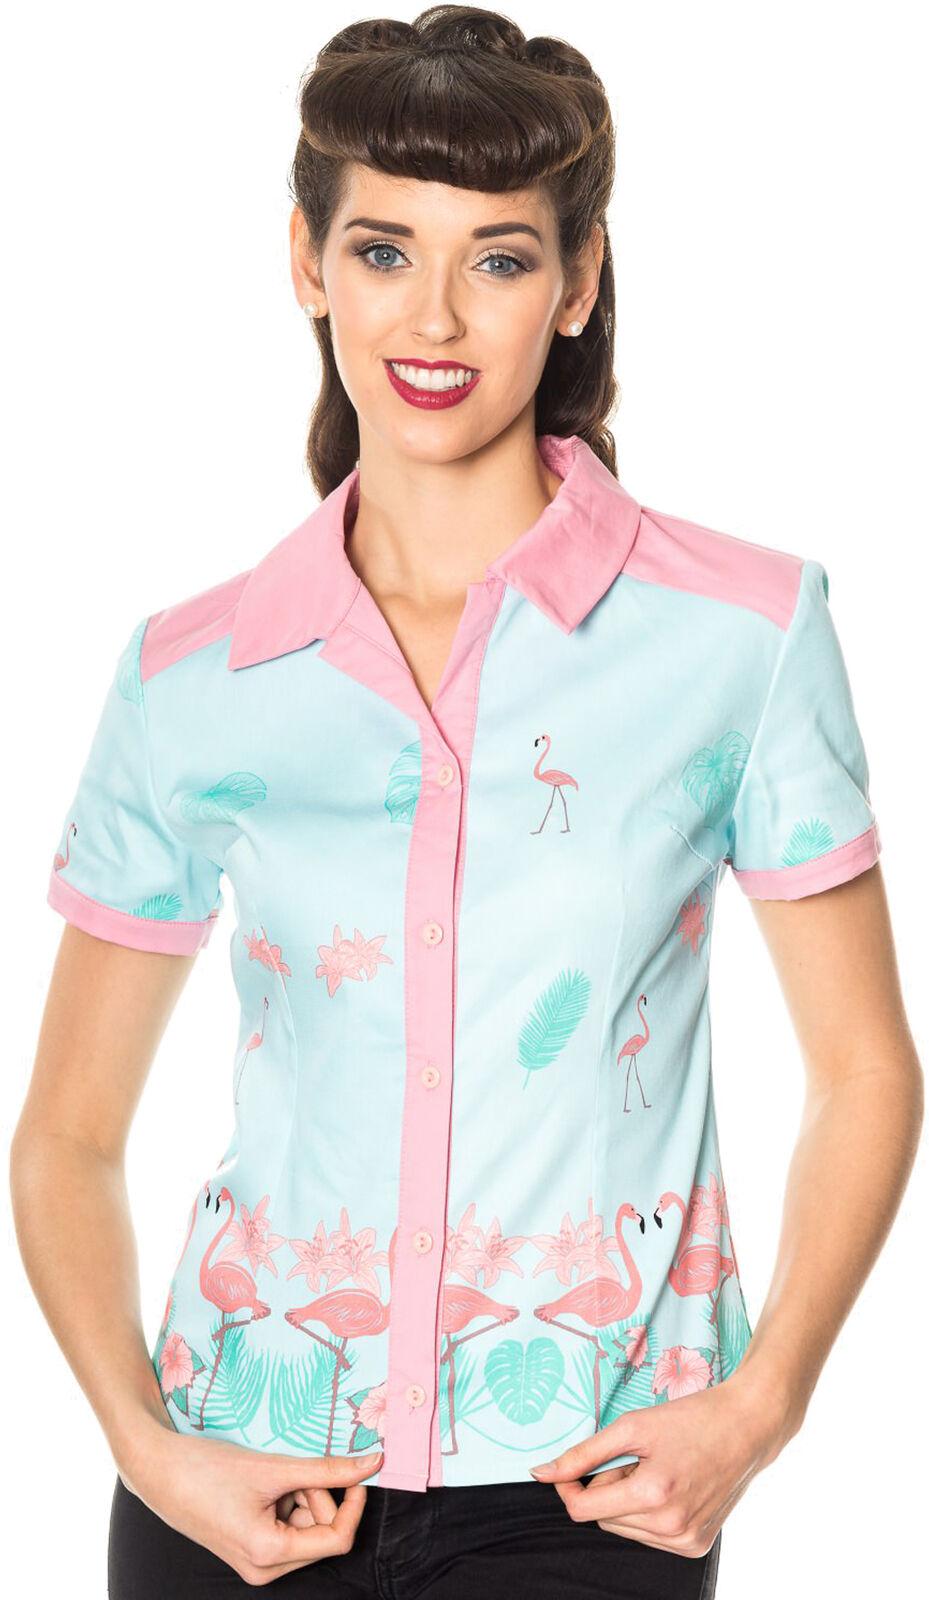 Dancing Days MY WAY Tropical FLAMINGO Vintage BlauSE Shirt Rockabilly